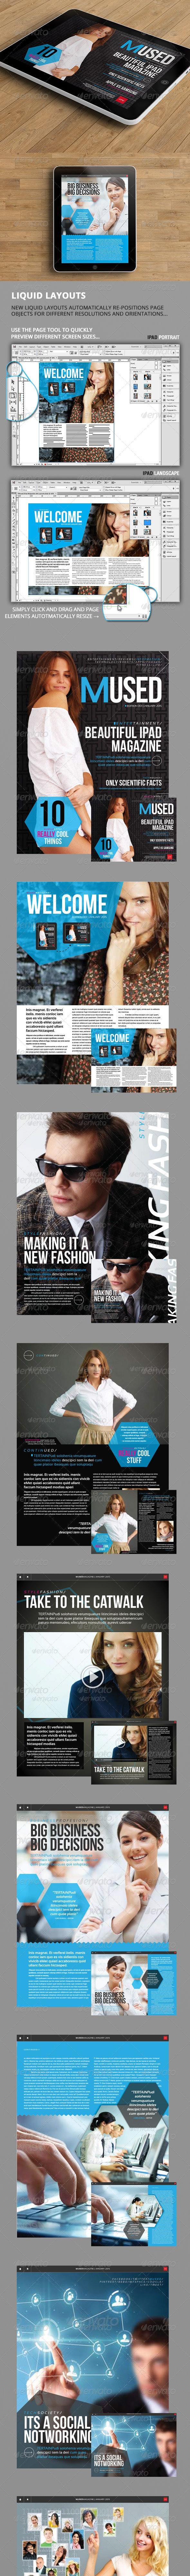 Mused iPad Magazine - Magazines Print Templates